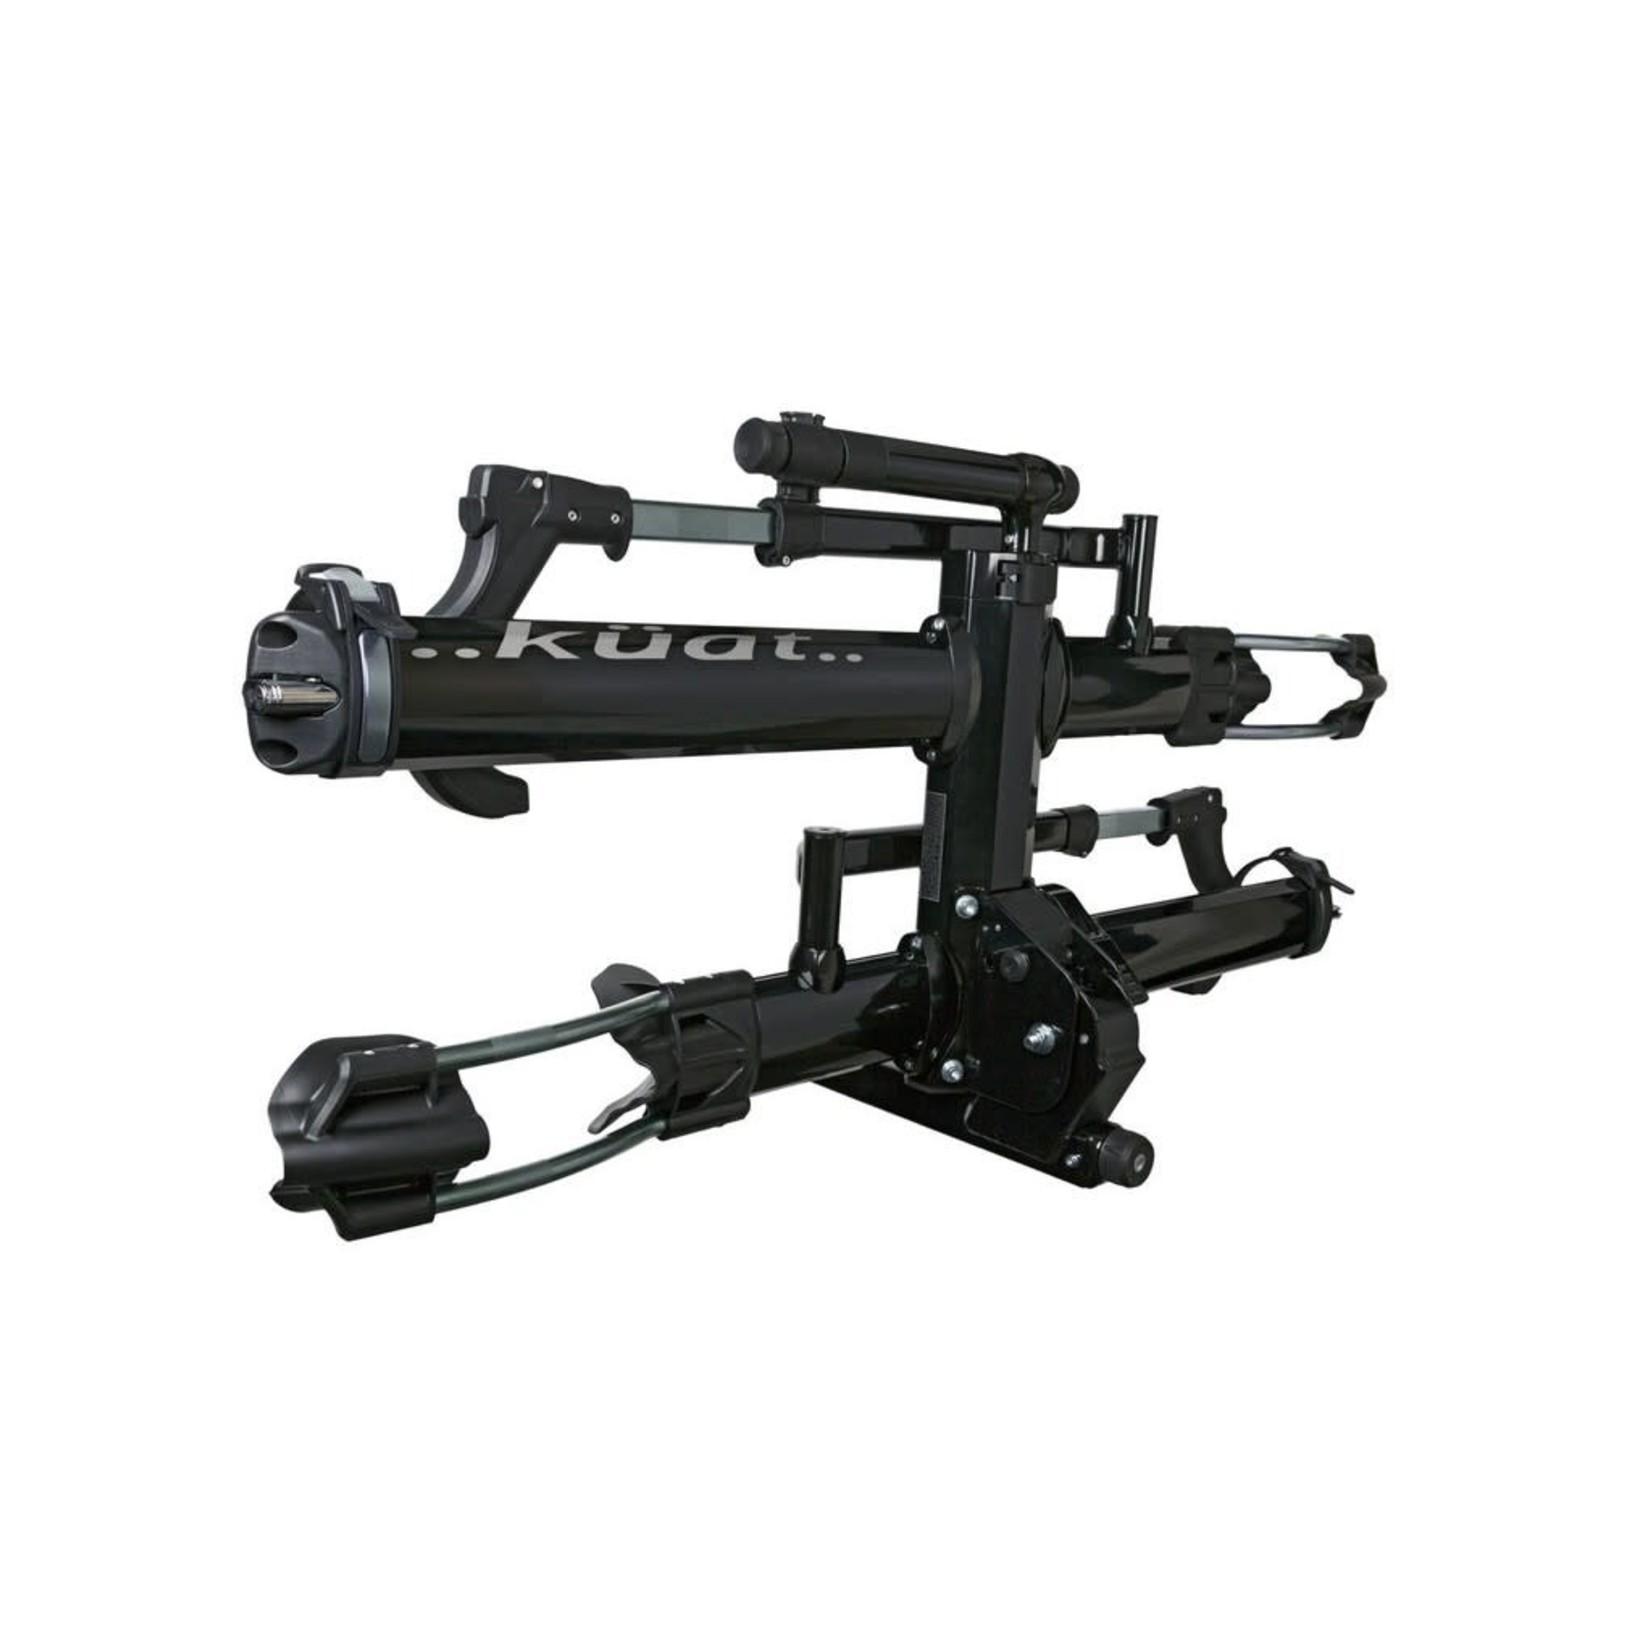 "Kuat Rack Kuat NV 2.0 2"" 2-Bike Black Metallic and Gray Anodize"